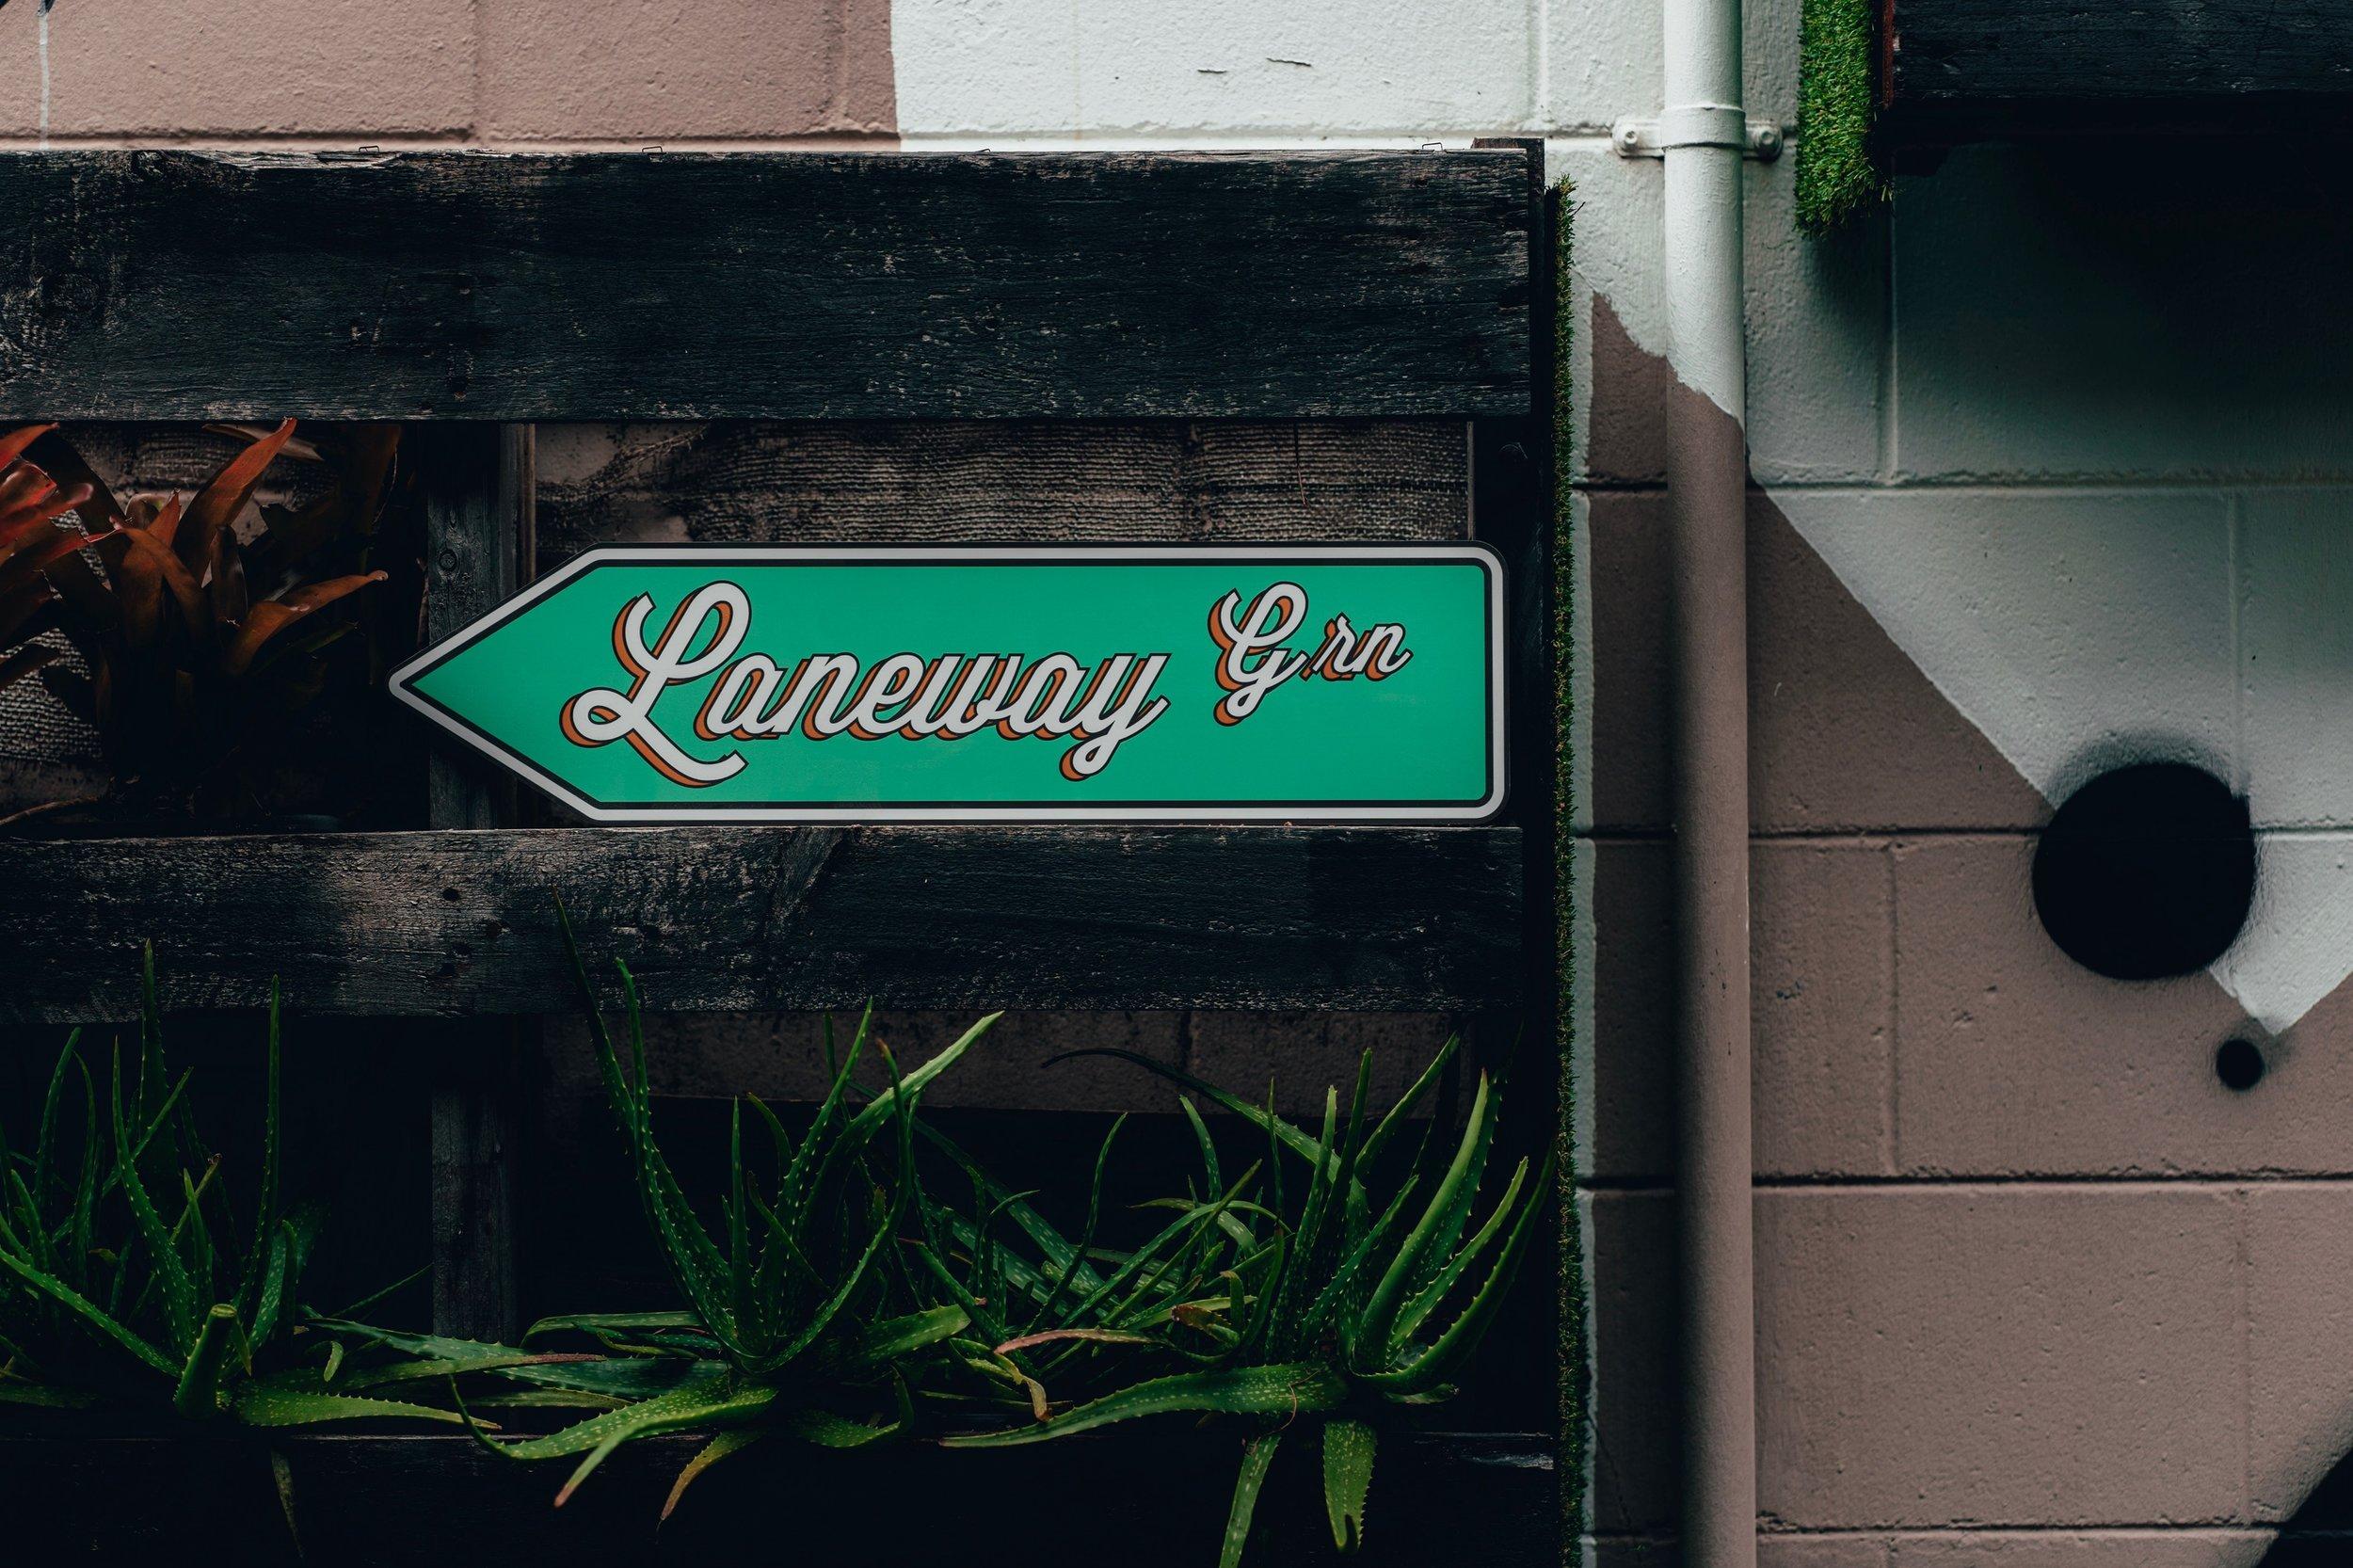 laneway green logo.jpg